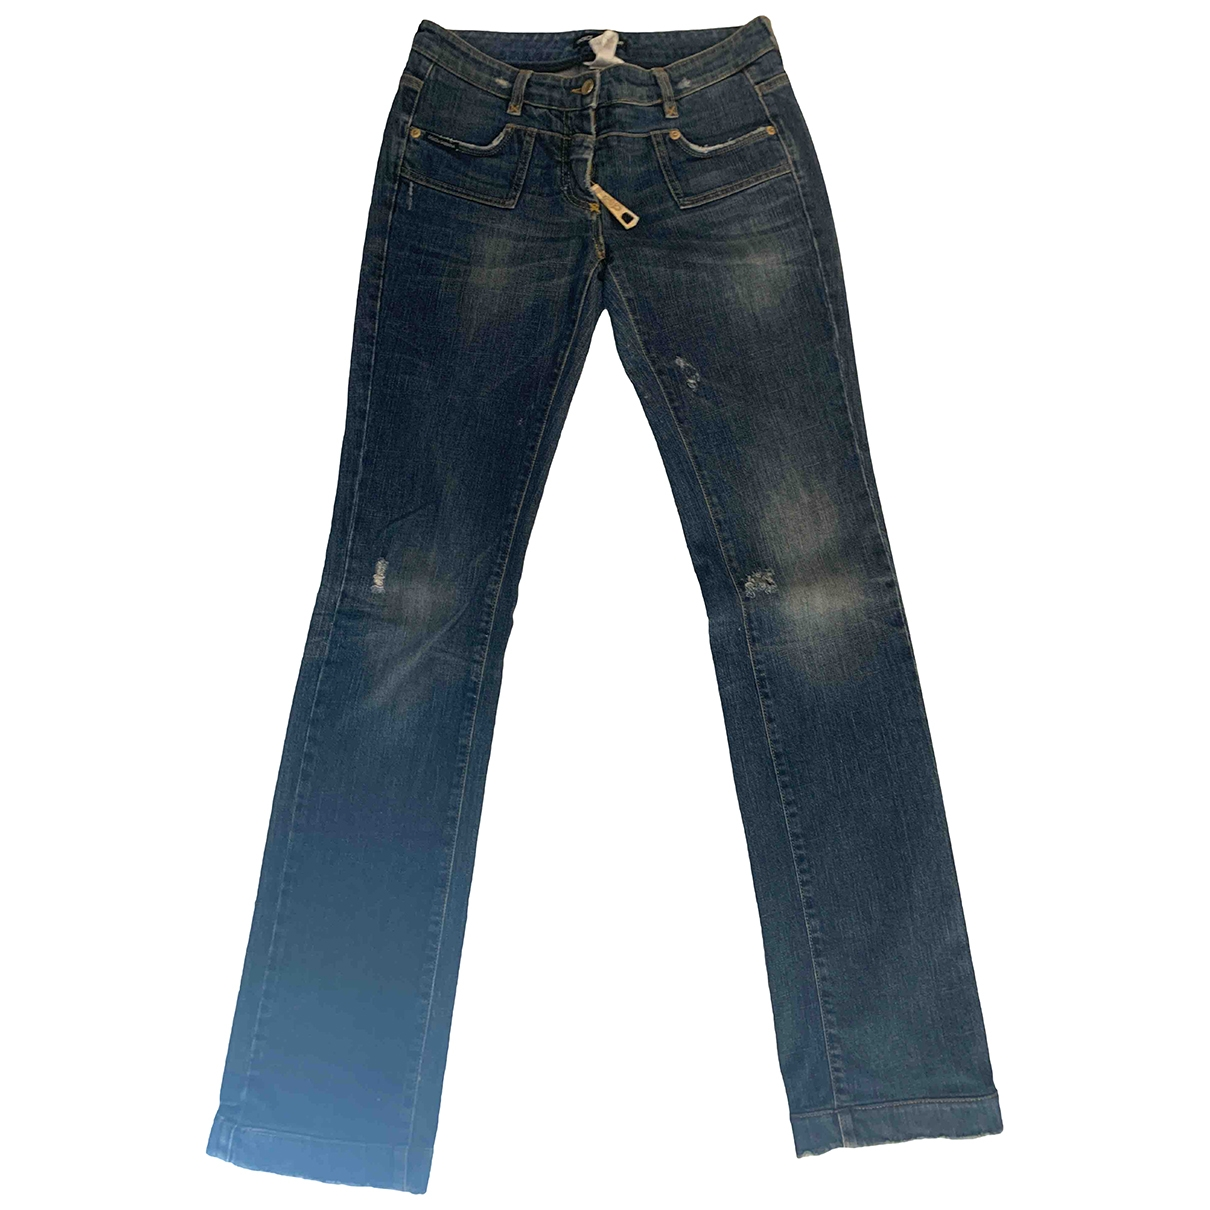 Dolce & Gabbana \N Blue Denim - Jeans Jeans for Women 38 FR